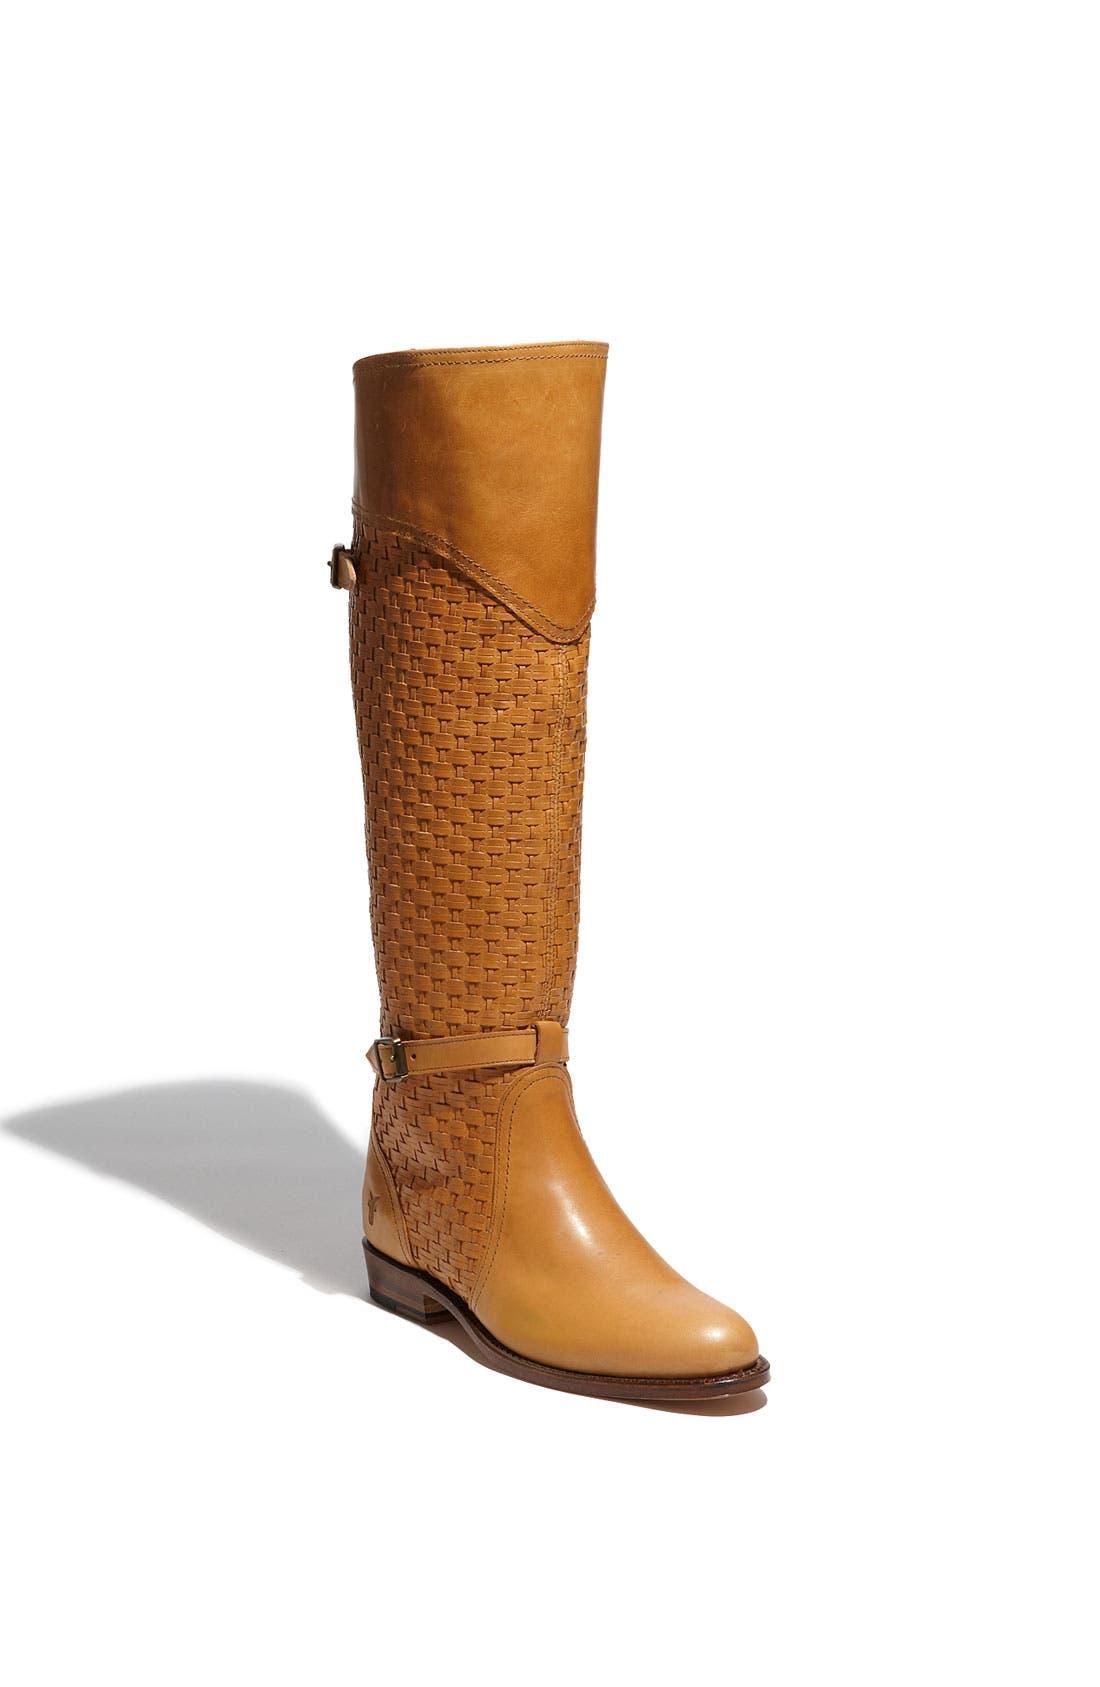 FRYE 'Dorado' Riding Boot, Main, color, 271